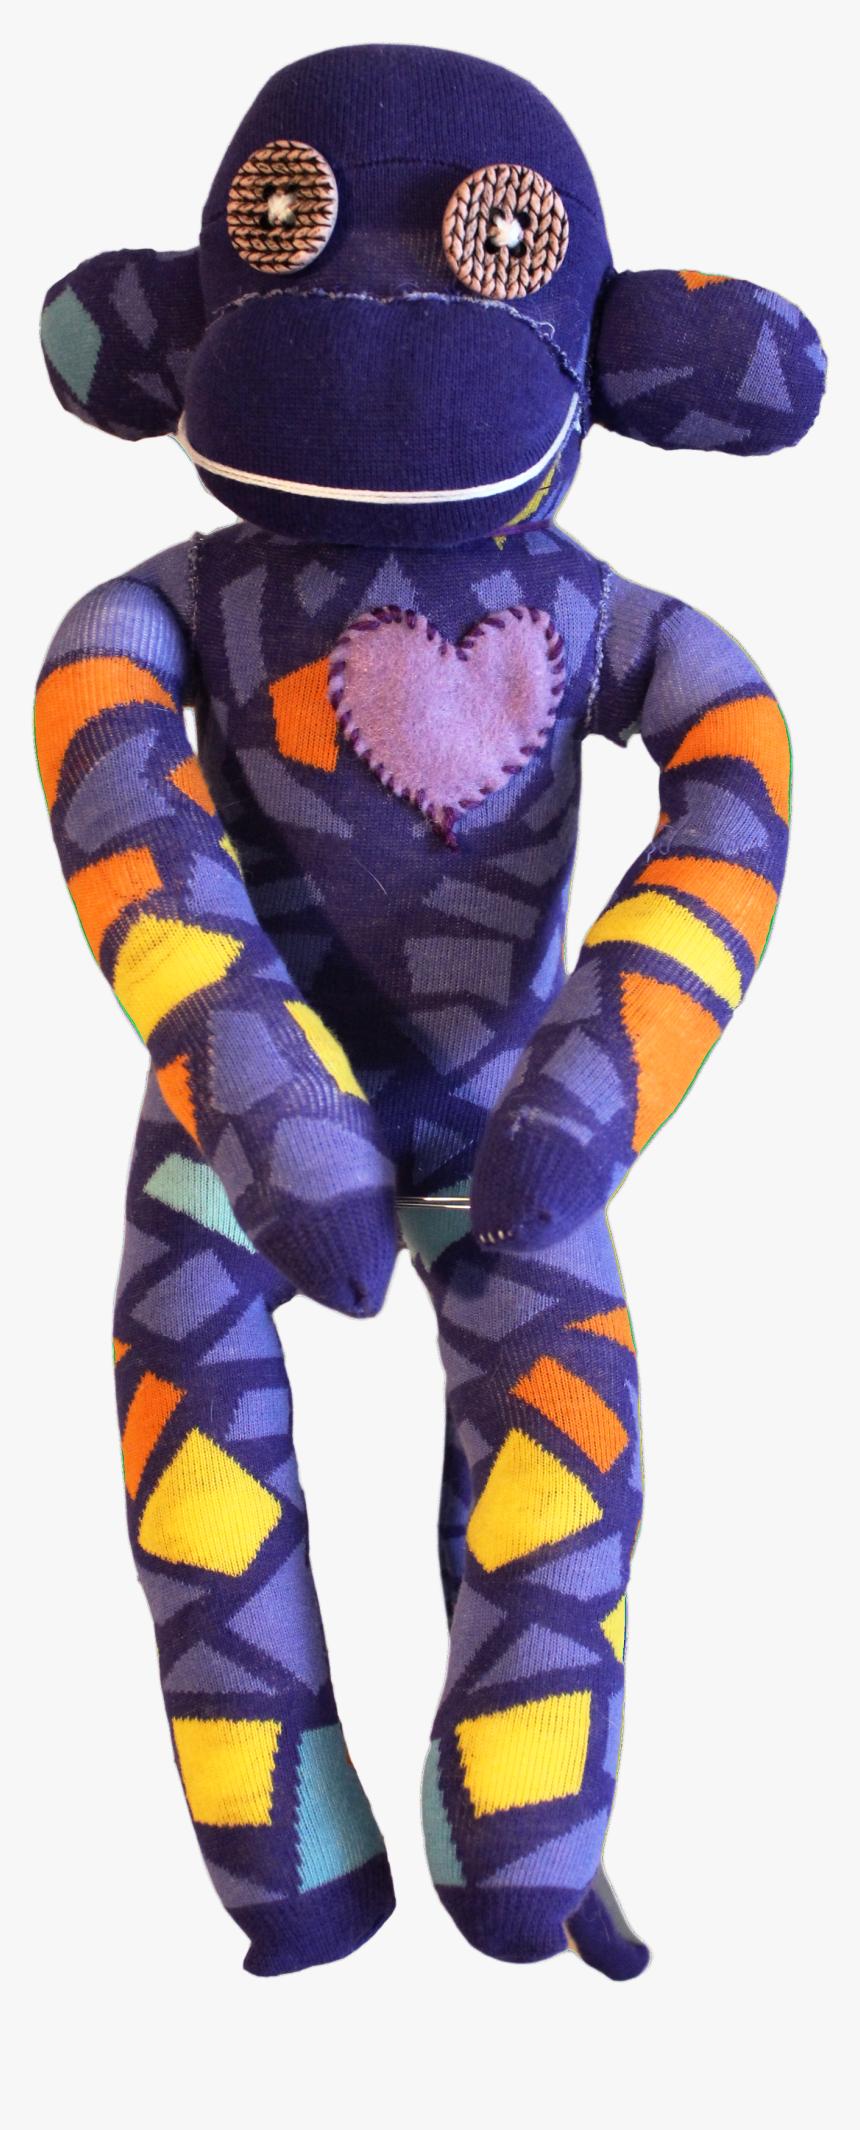 Handmade Sock Monkey Plush Toy With Funky Pattern Socks - ÷ Pattern Socks, HD Png Download, Free Download